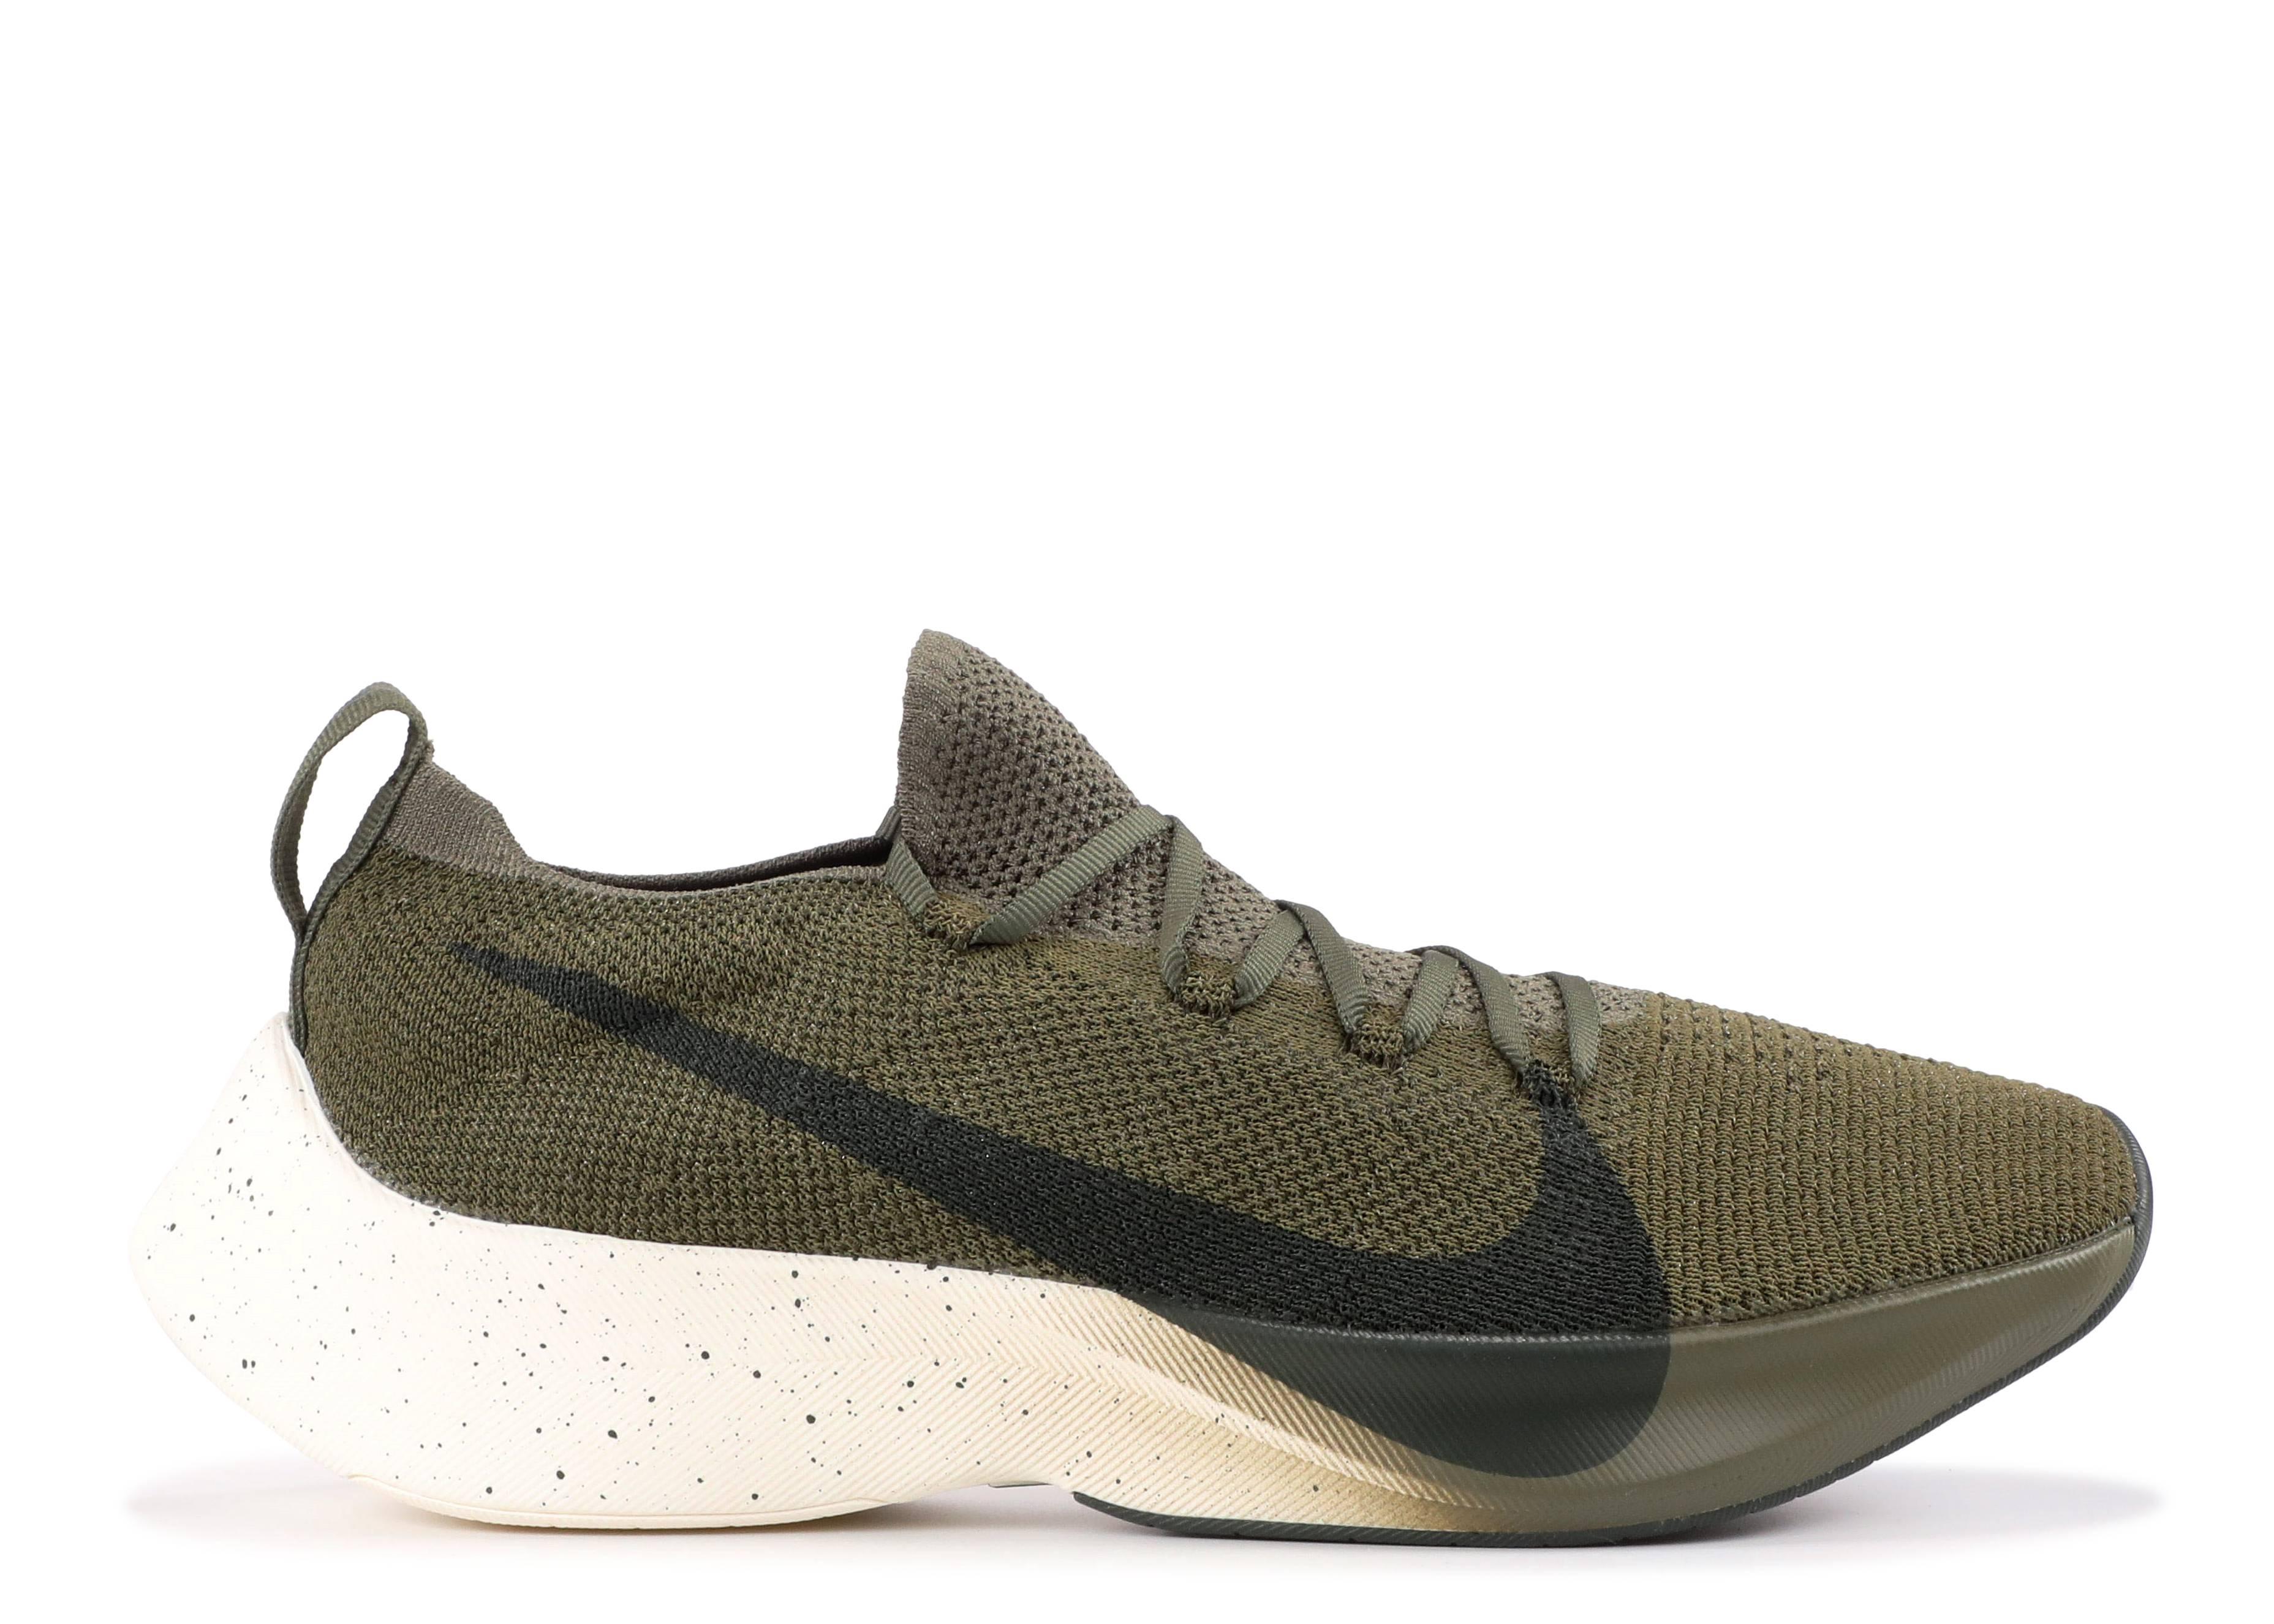 2d13c0cde8 Nike Vapor Street Flyknit - Nike - AQ1763 201 - medium olive/sequoia ...